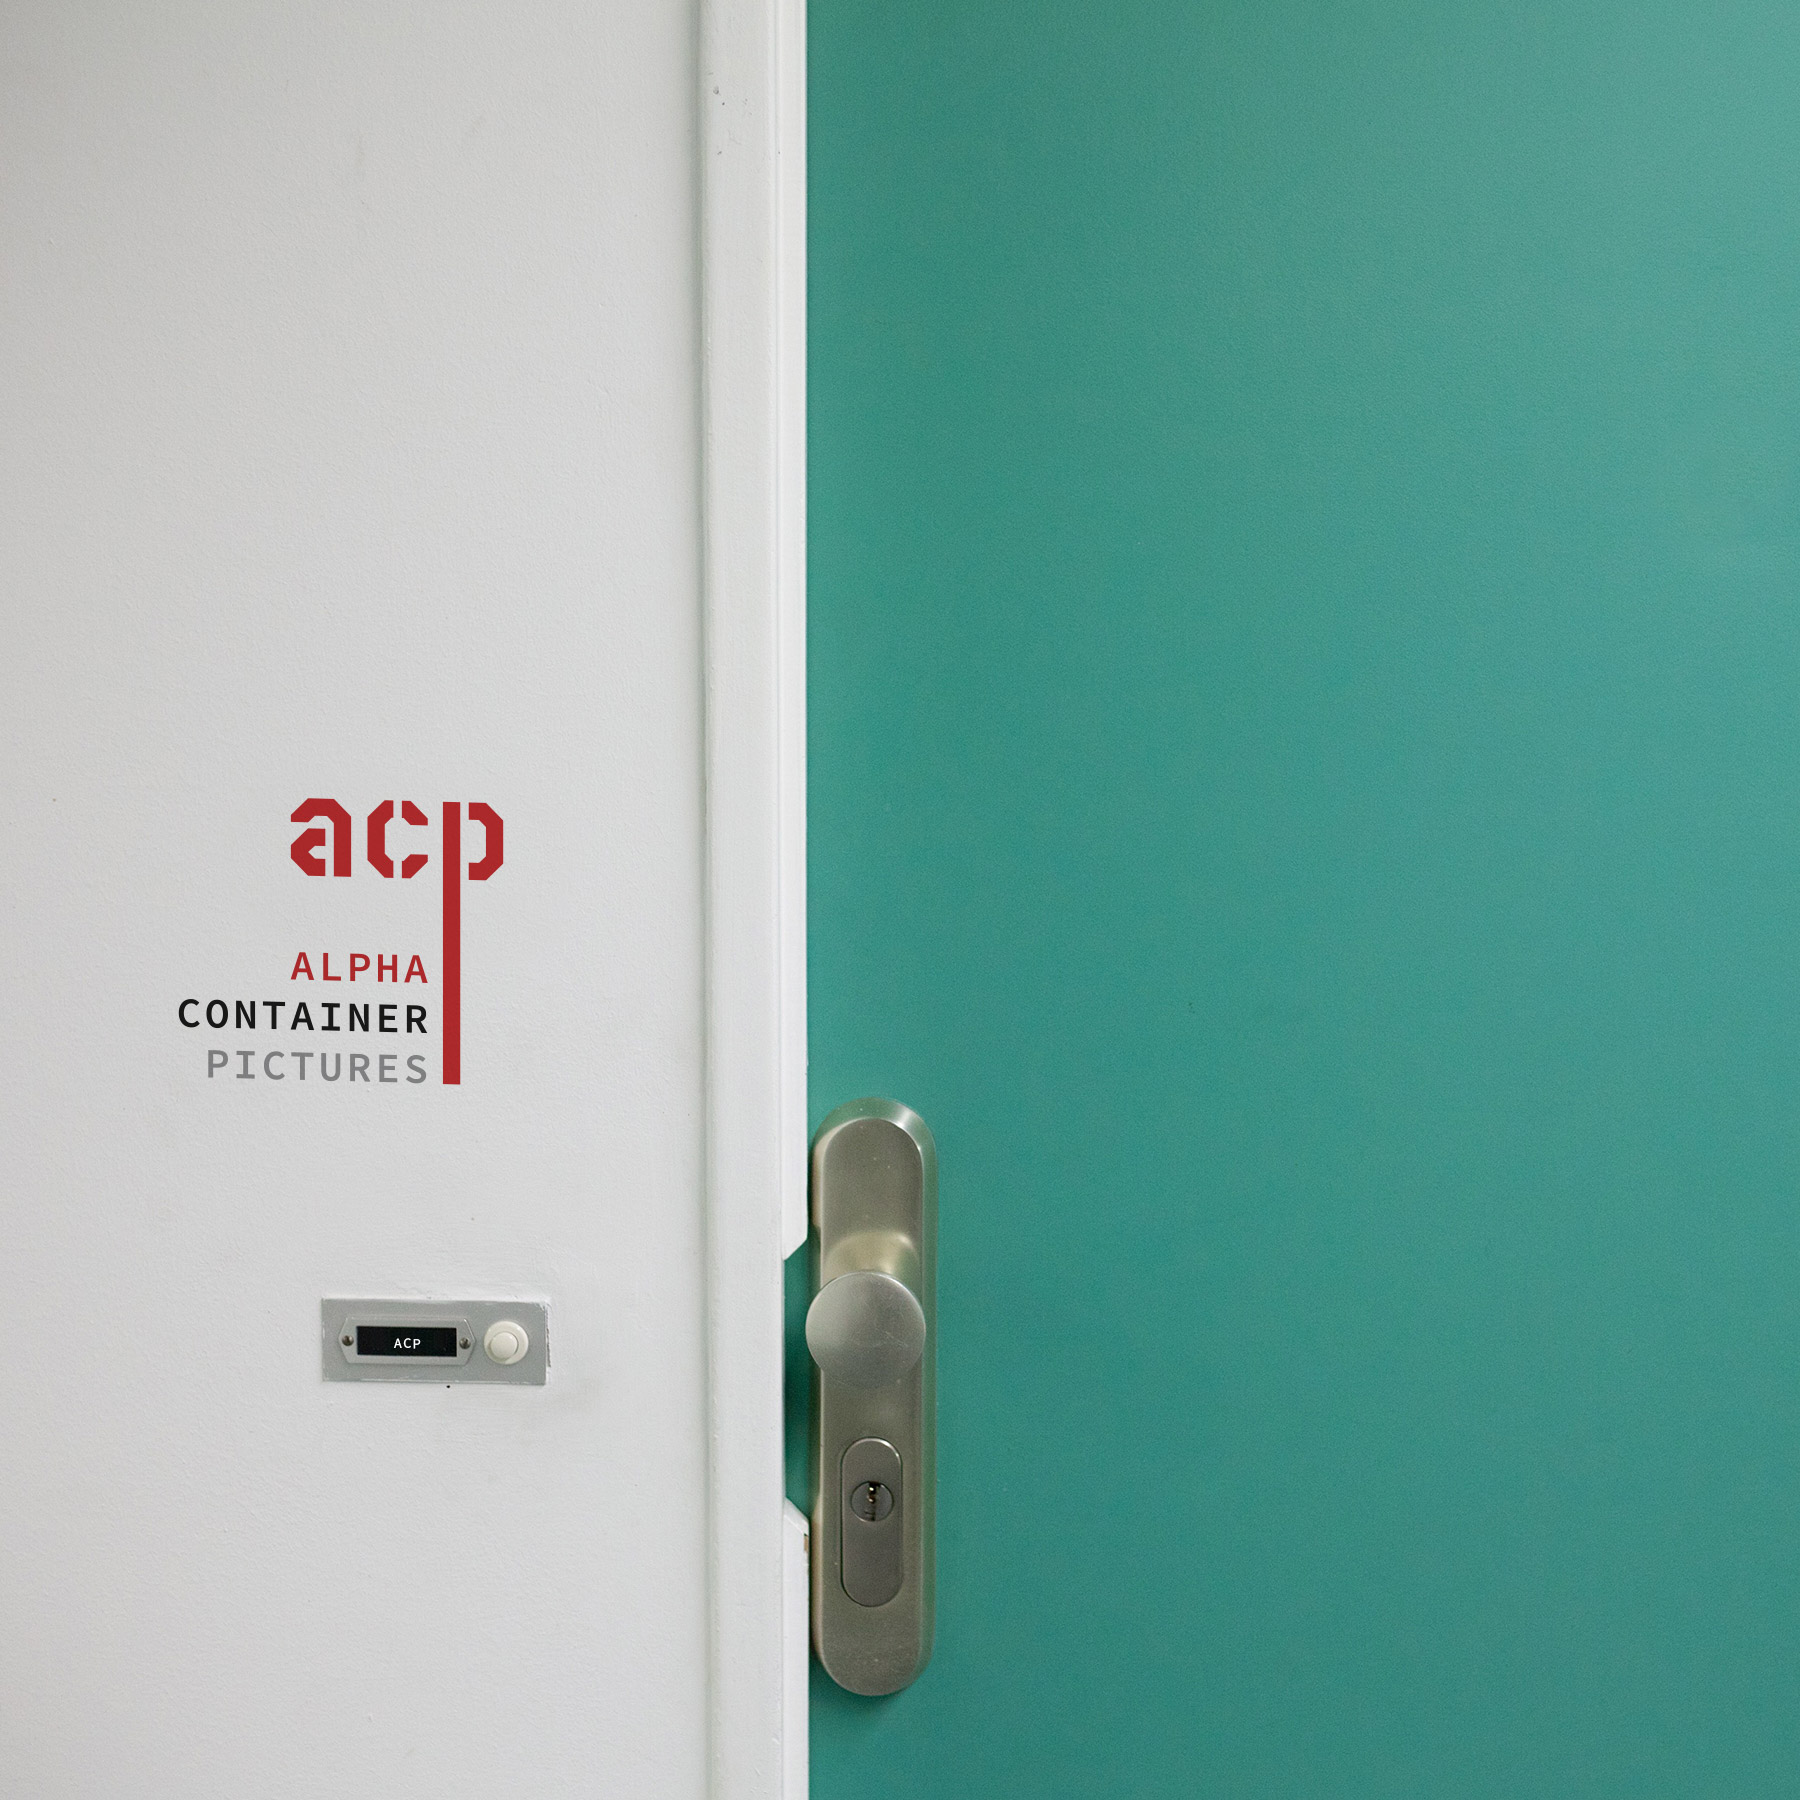 acp-sign-1800×1800